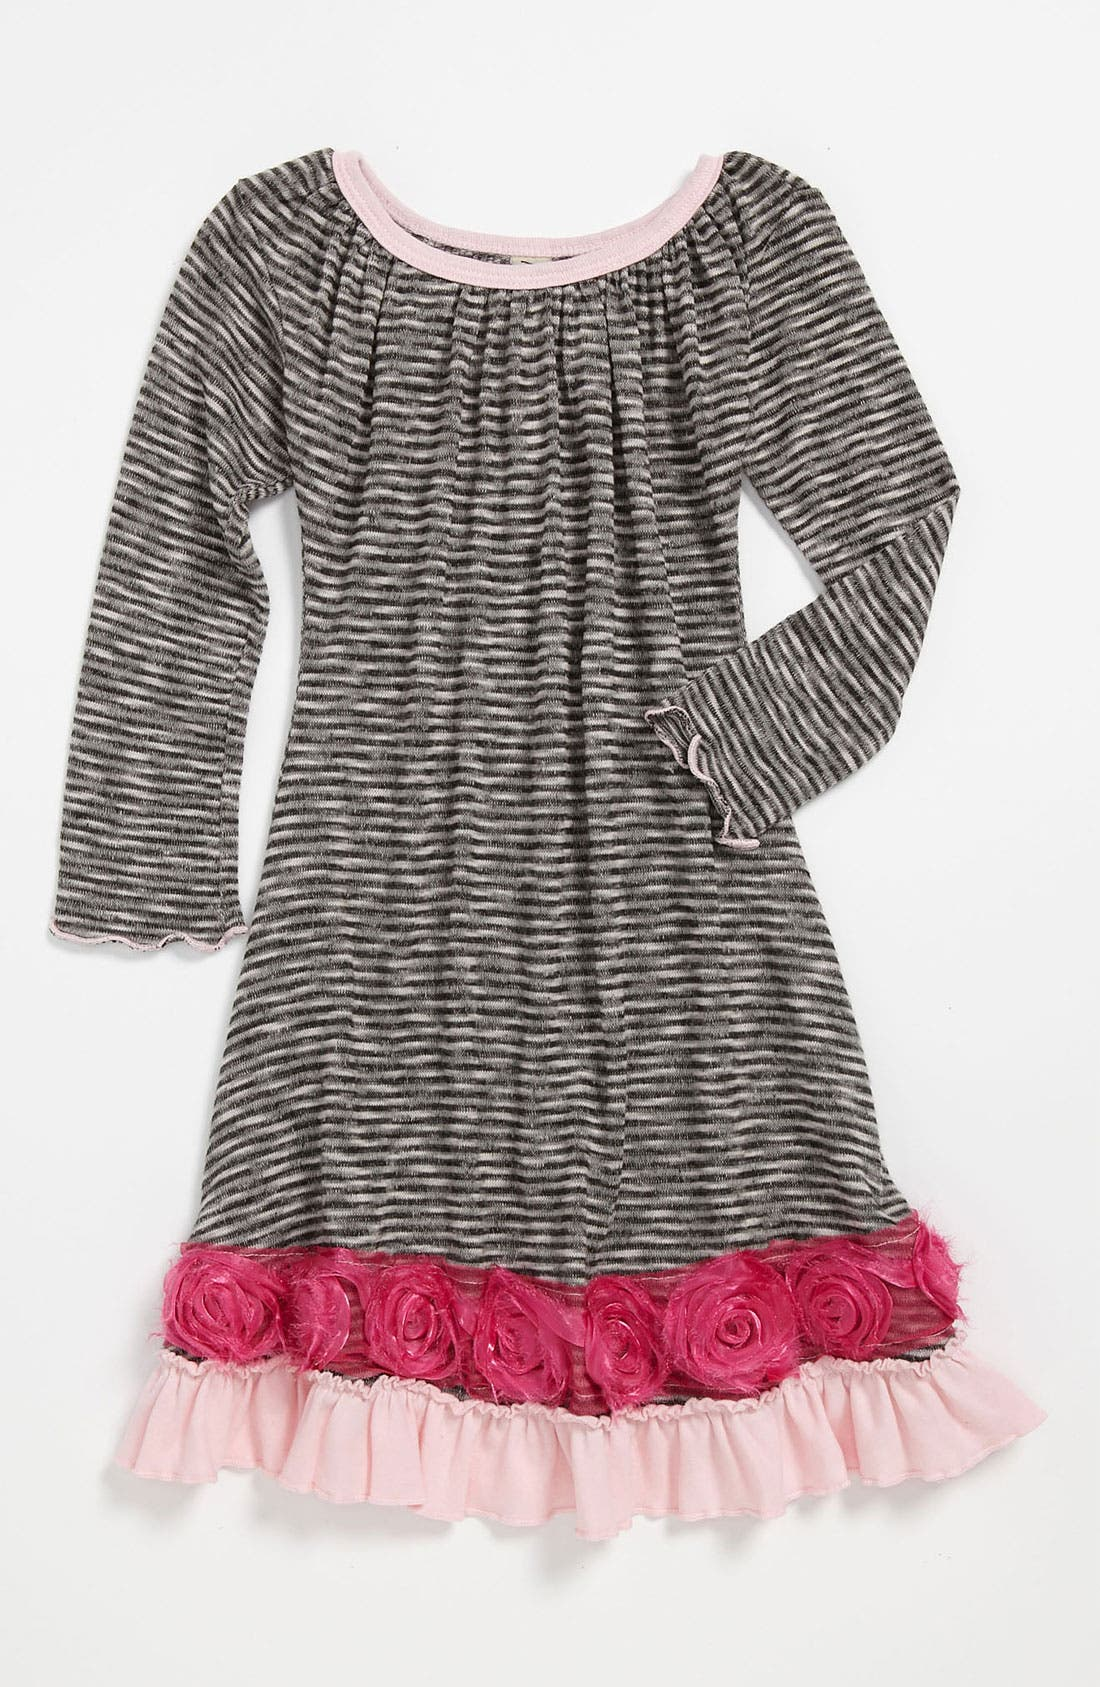 Alternate Image 1 Selected - Mignone Stripe Dress (Toddler)